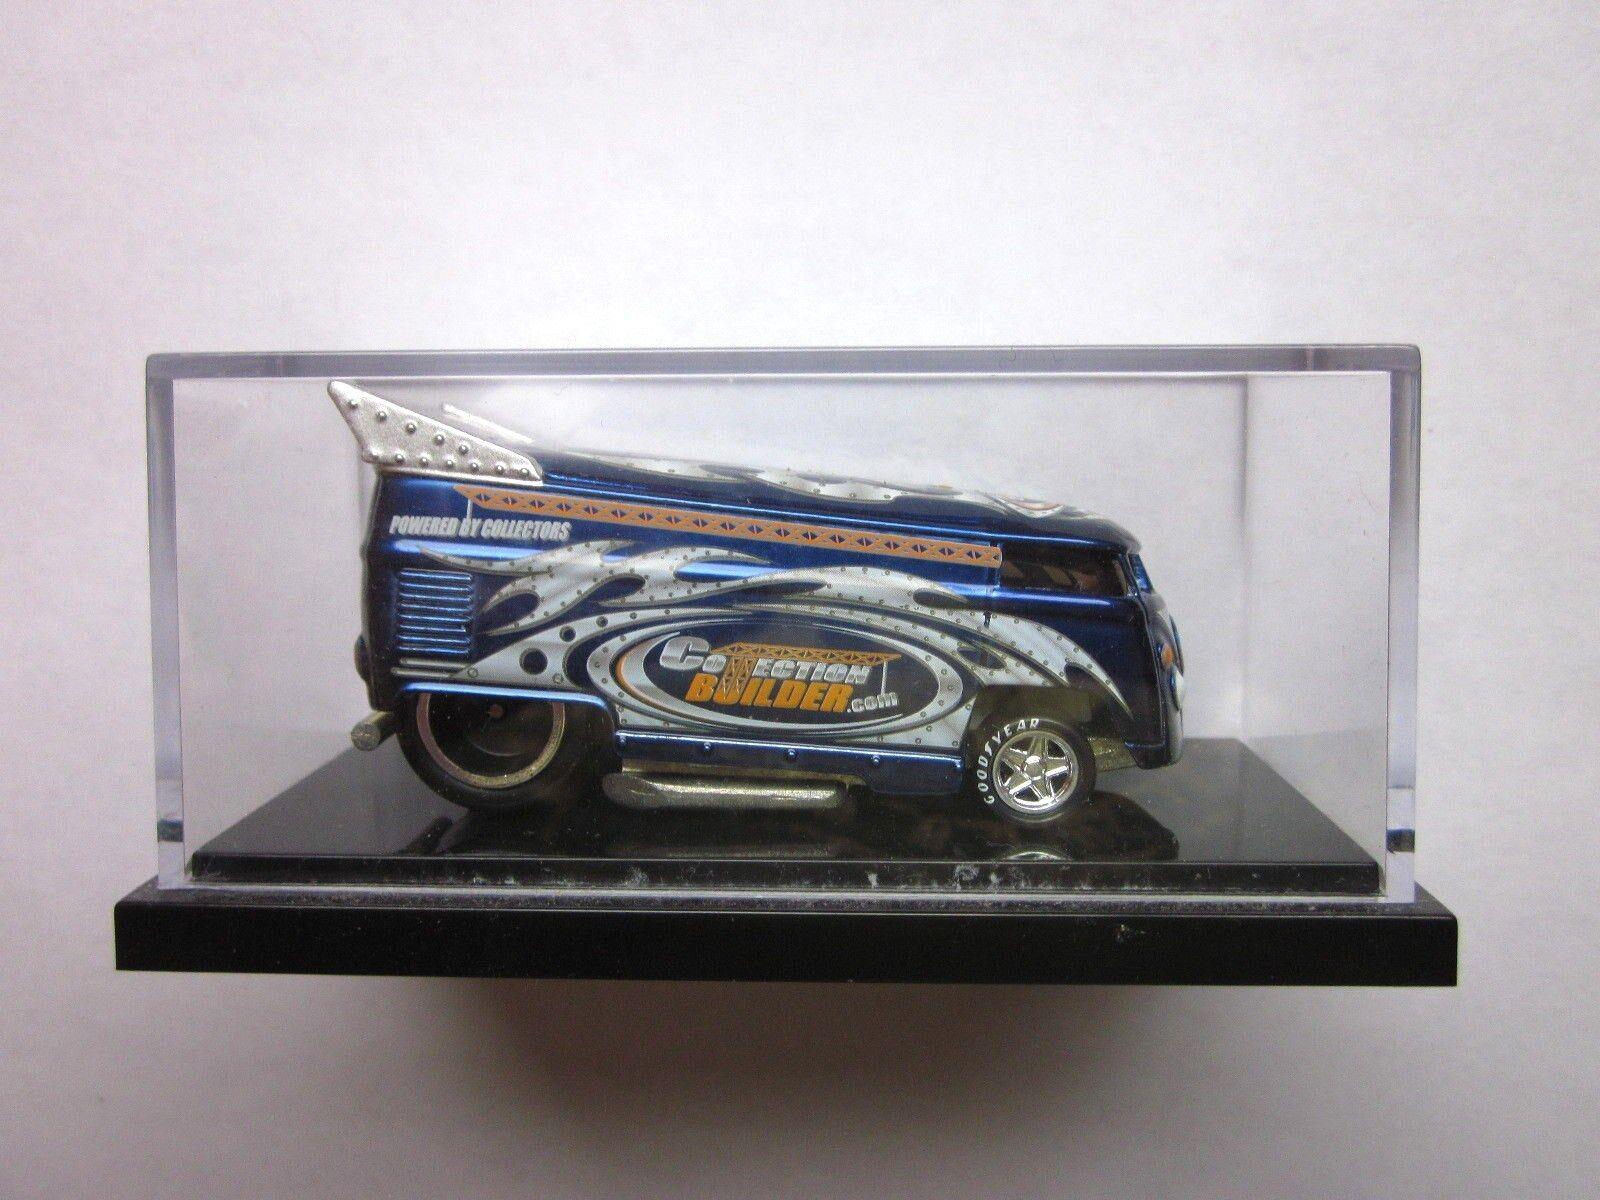 varm HJUL LIBERTY FRÄMJANDE - blå samlingBULLER VW DRAG buss - 198  1300